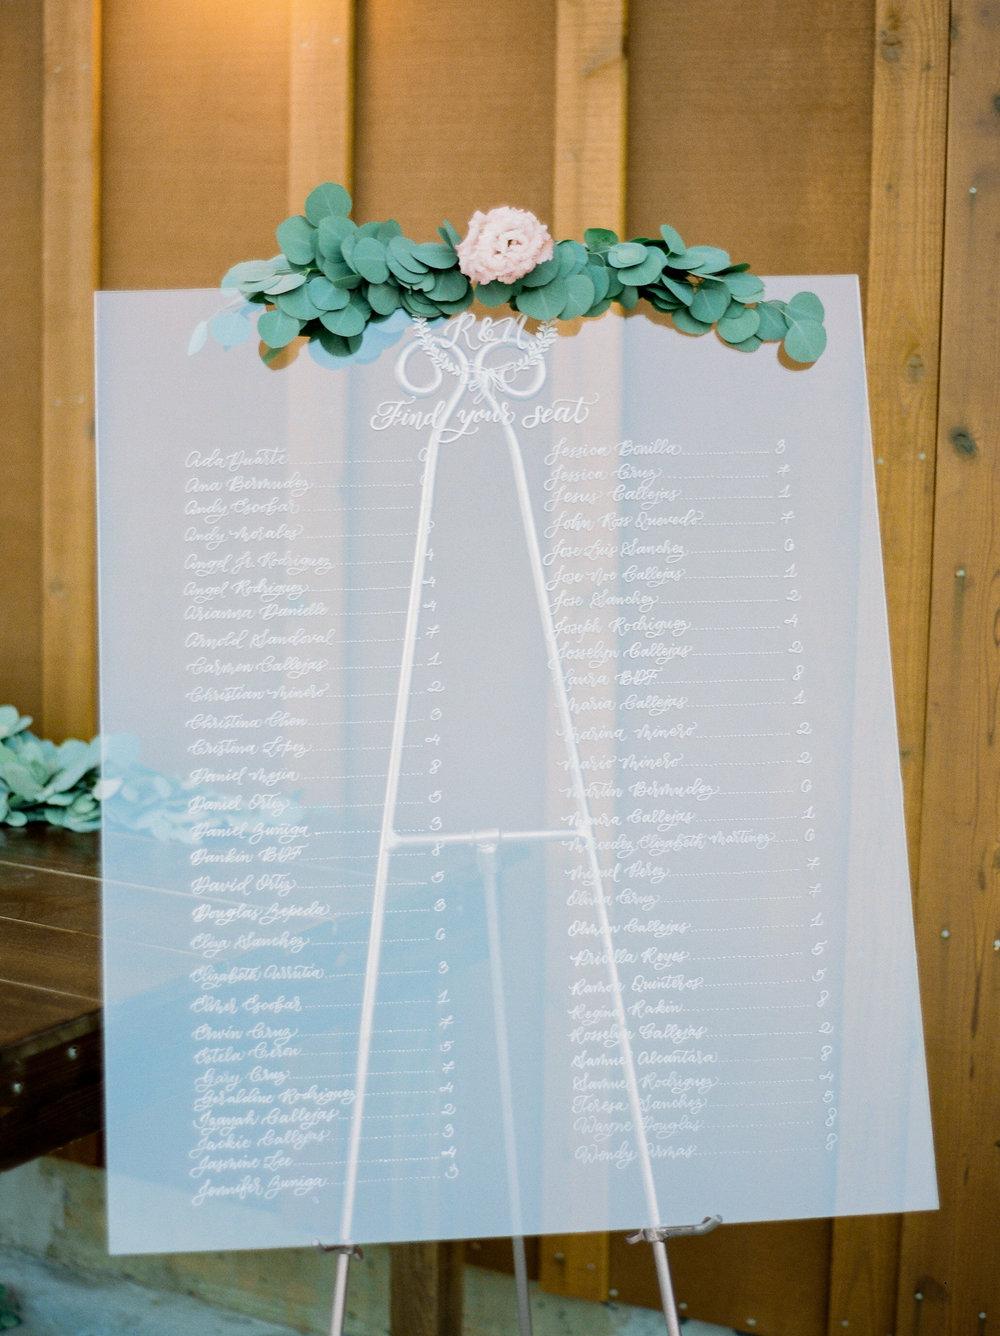 Yosemite wedding acrylic seating chart calligraphy items by paperloveme1.jpg